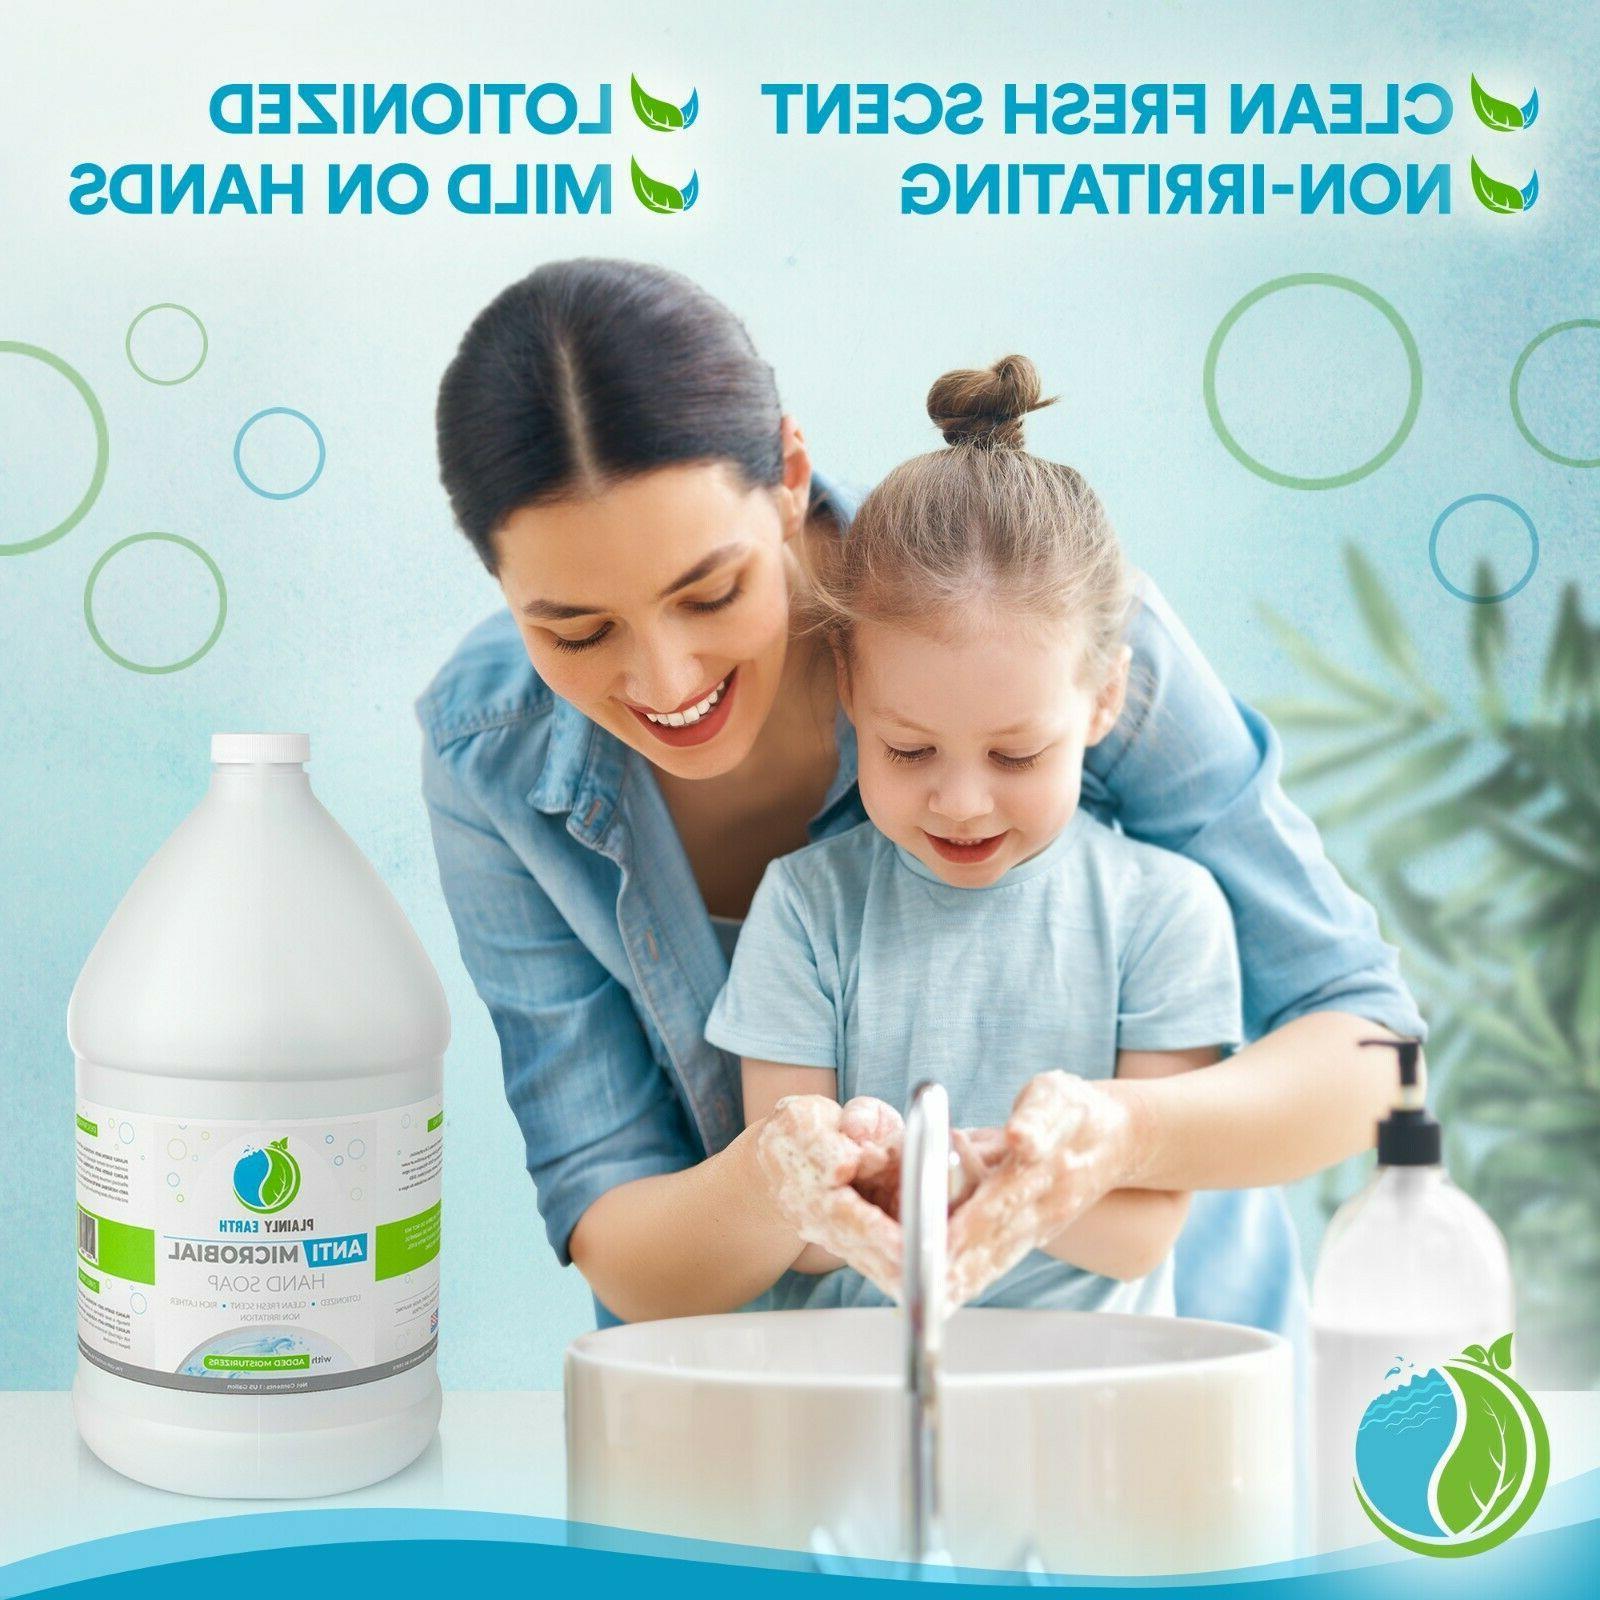 Anti Microbial Soap Gallon